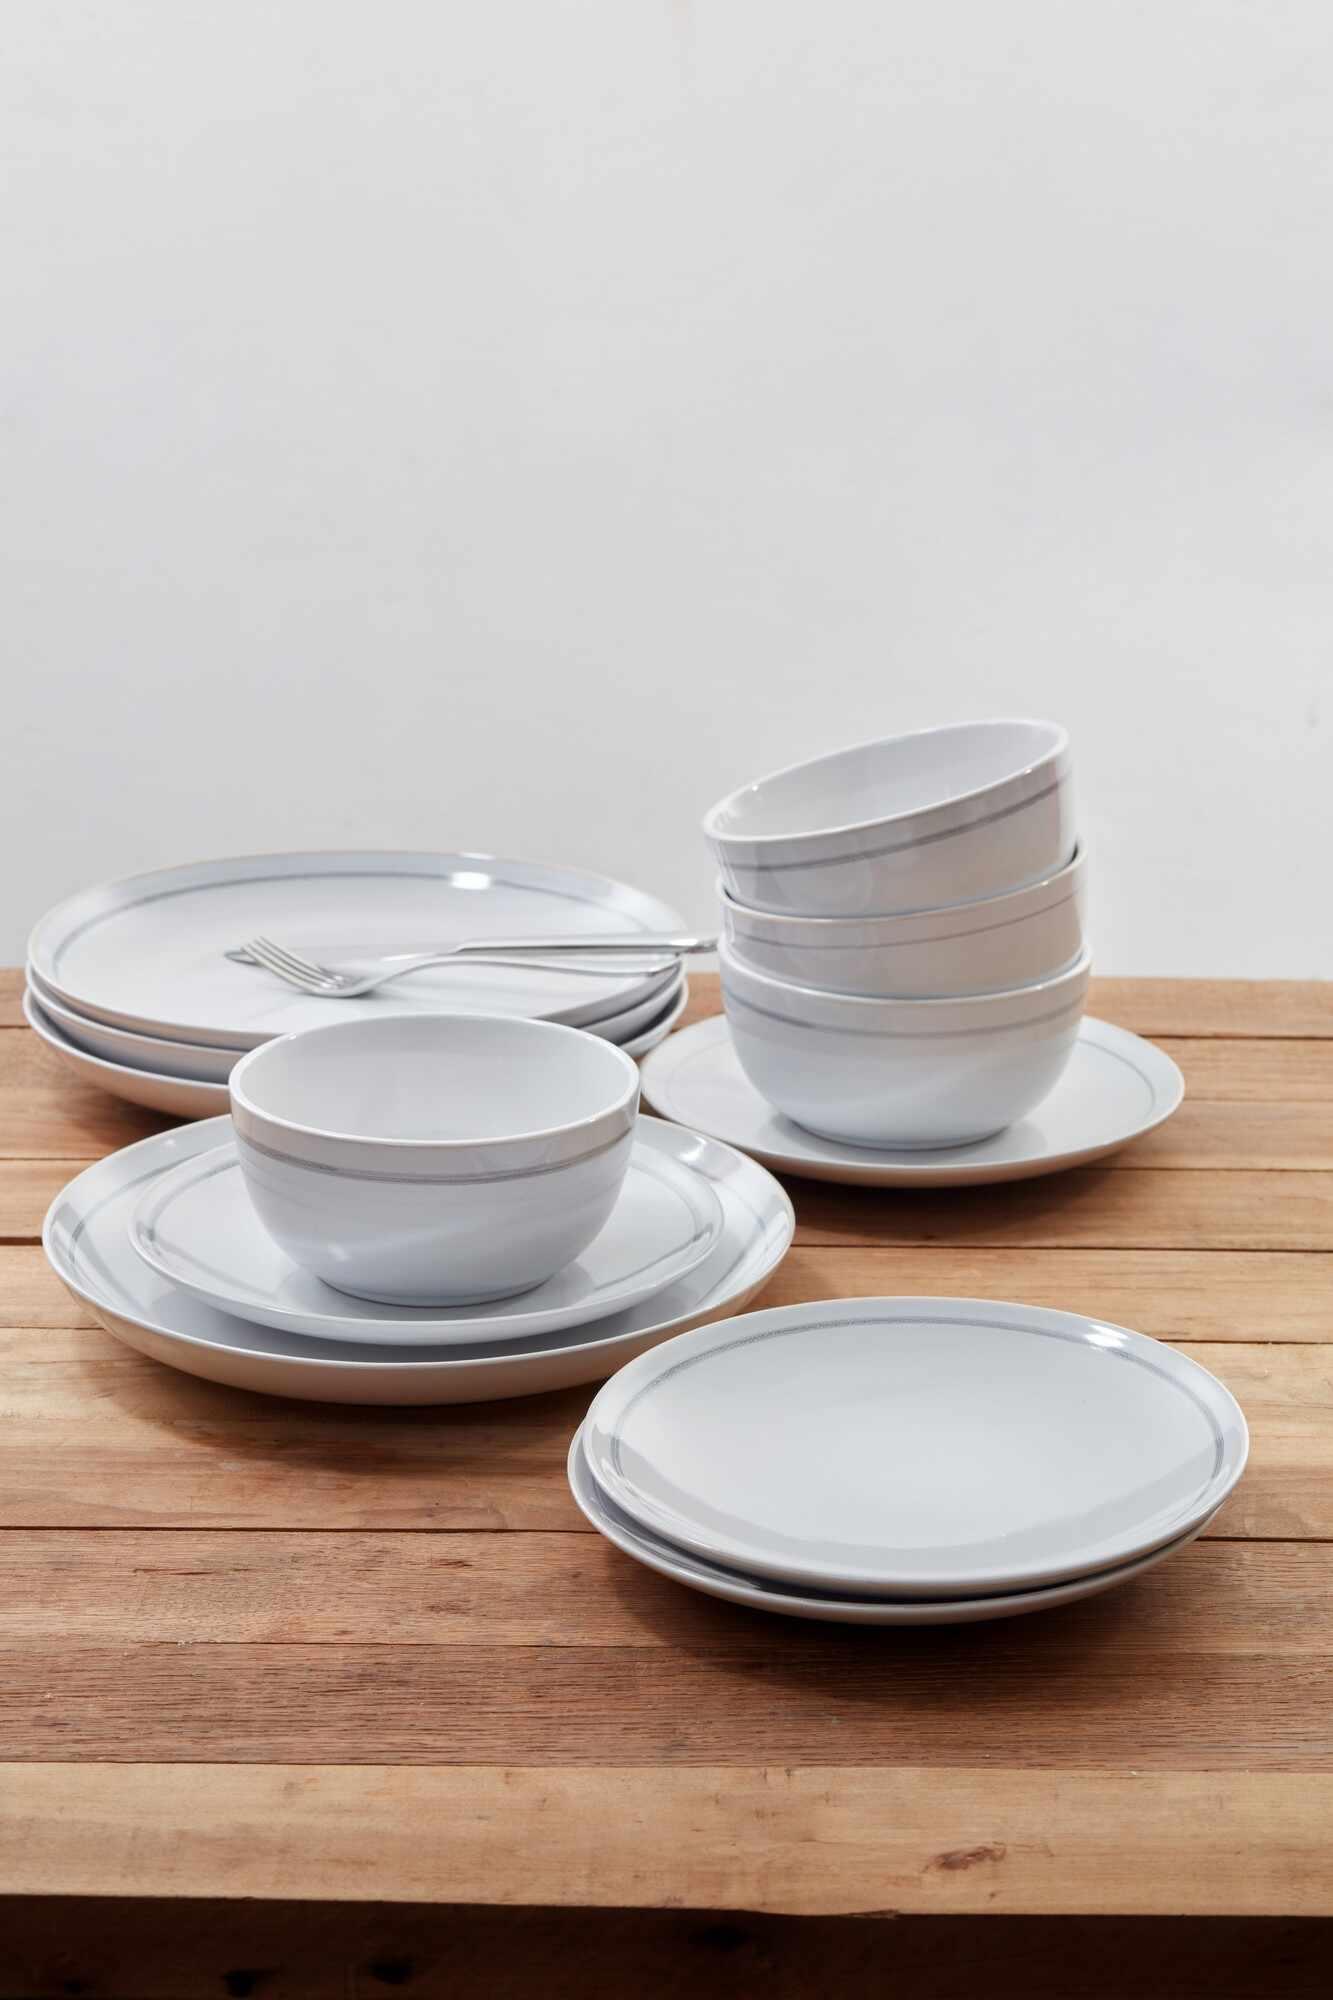 Set vesela Patine Stoneware, White, Jamie Oliver, 12 piese la pret 481 lei